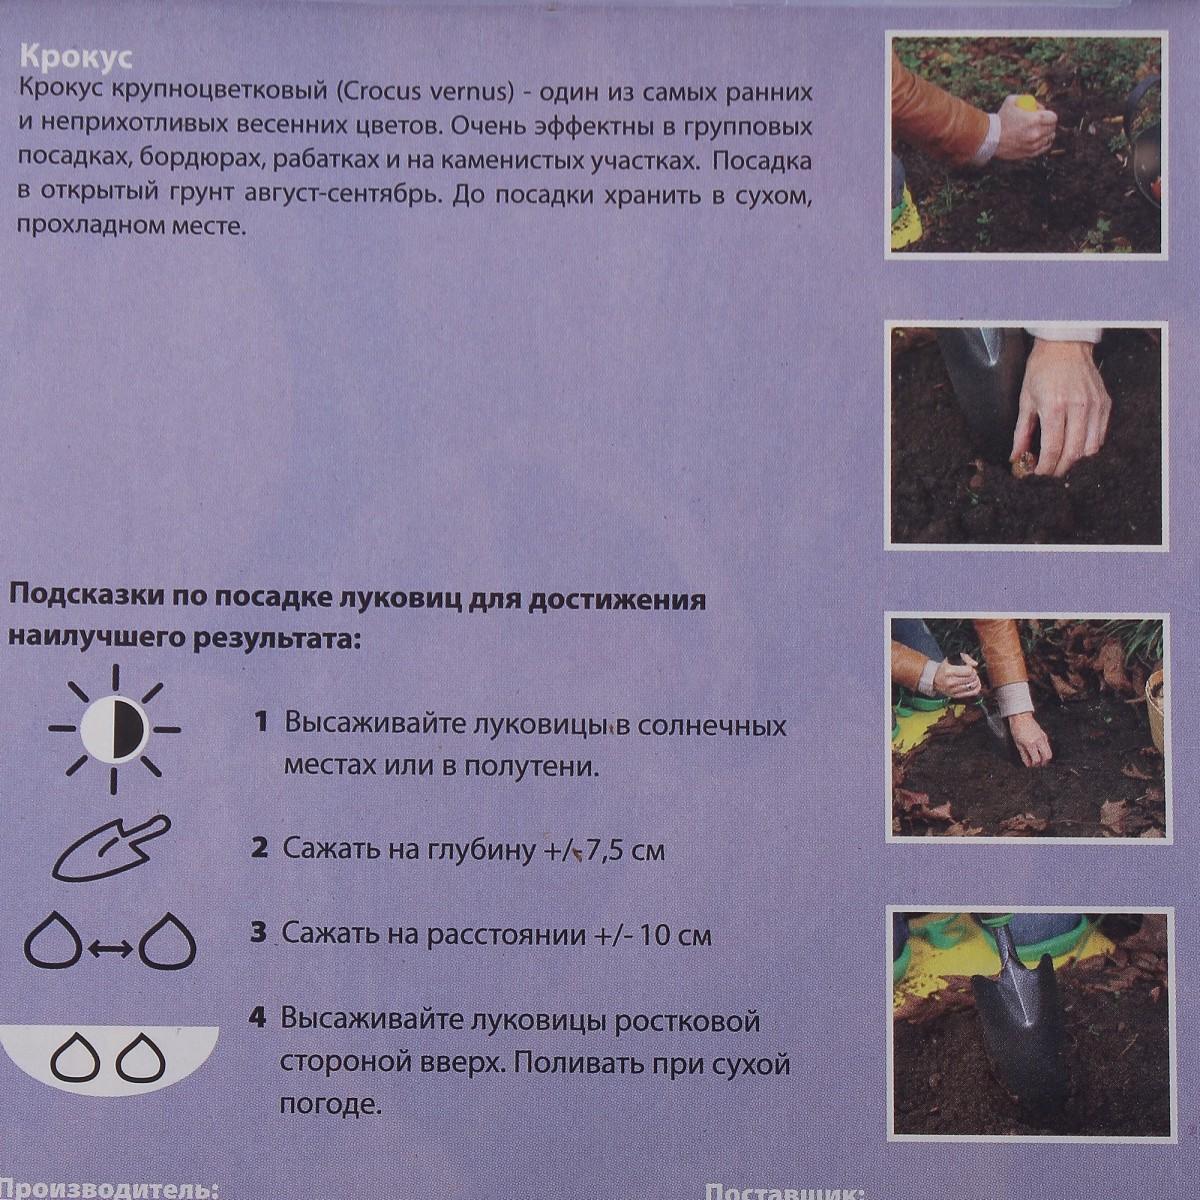 Крокус Страйпд Бьюти Размер Луковицы 7/8